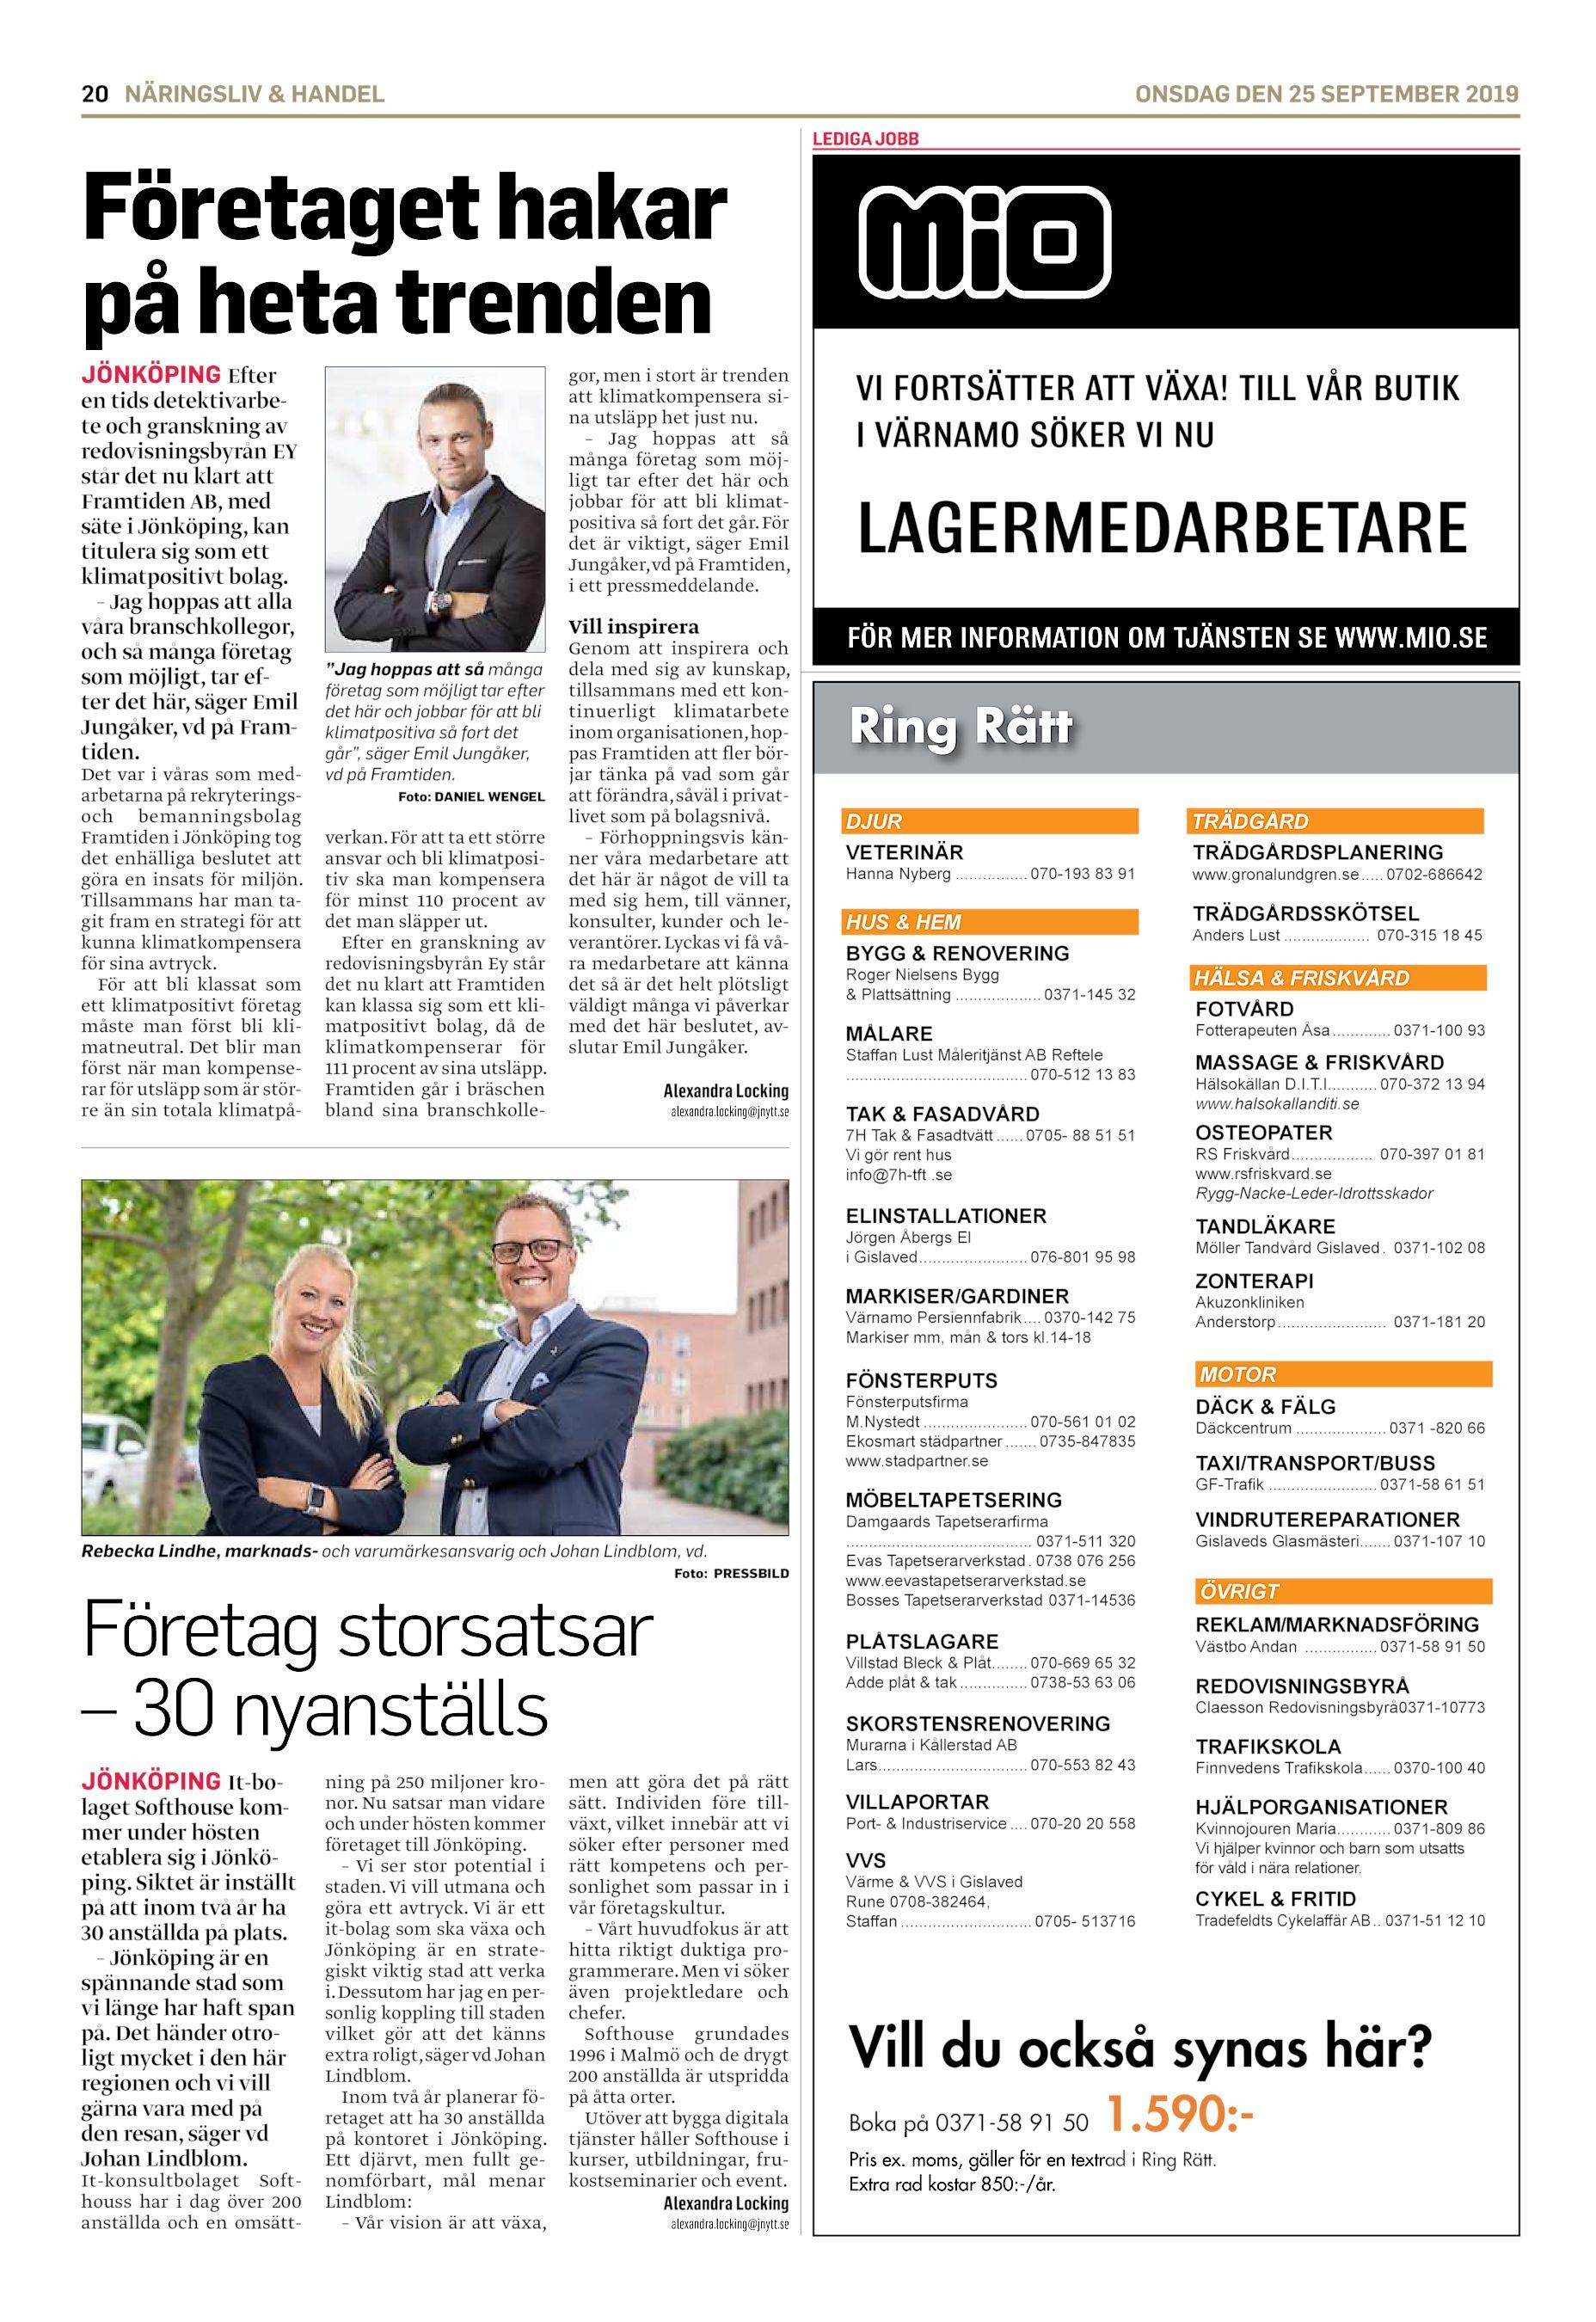 Storgatan 53 Vstra Gtalands Ln, Limmared - patient-survey.net